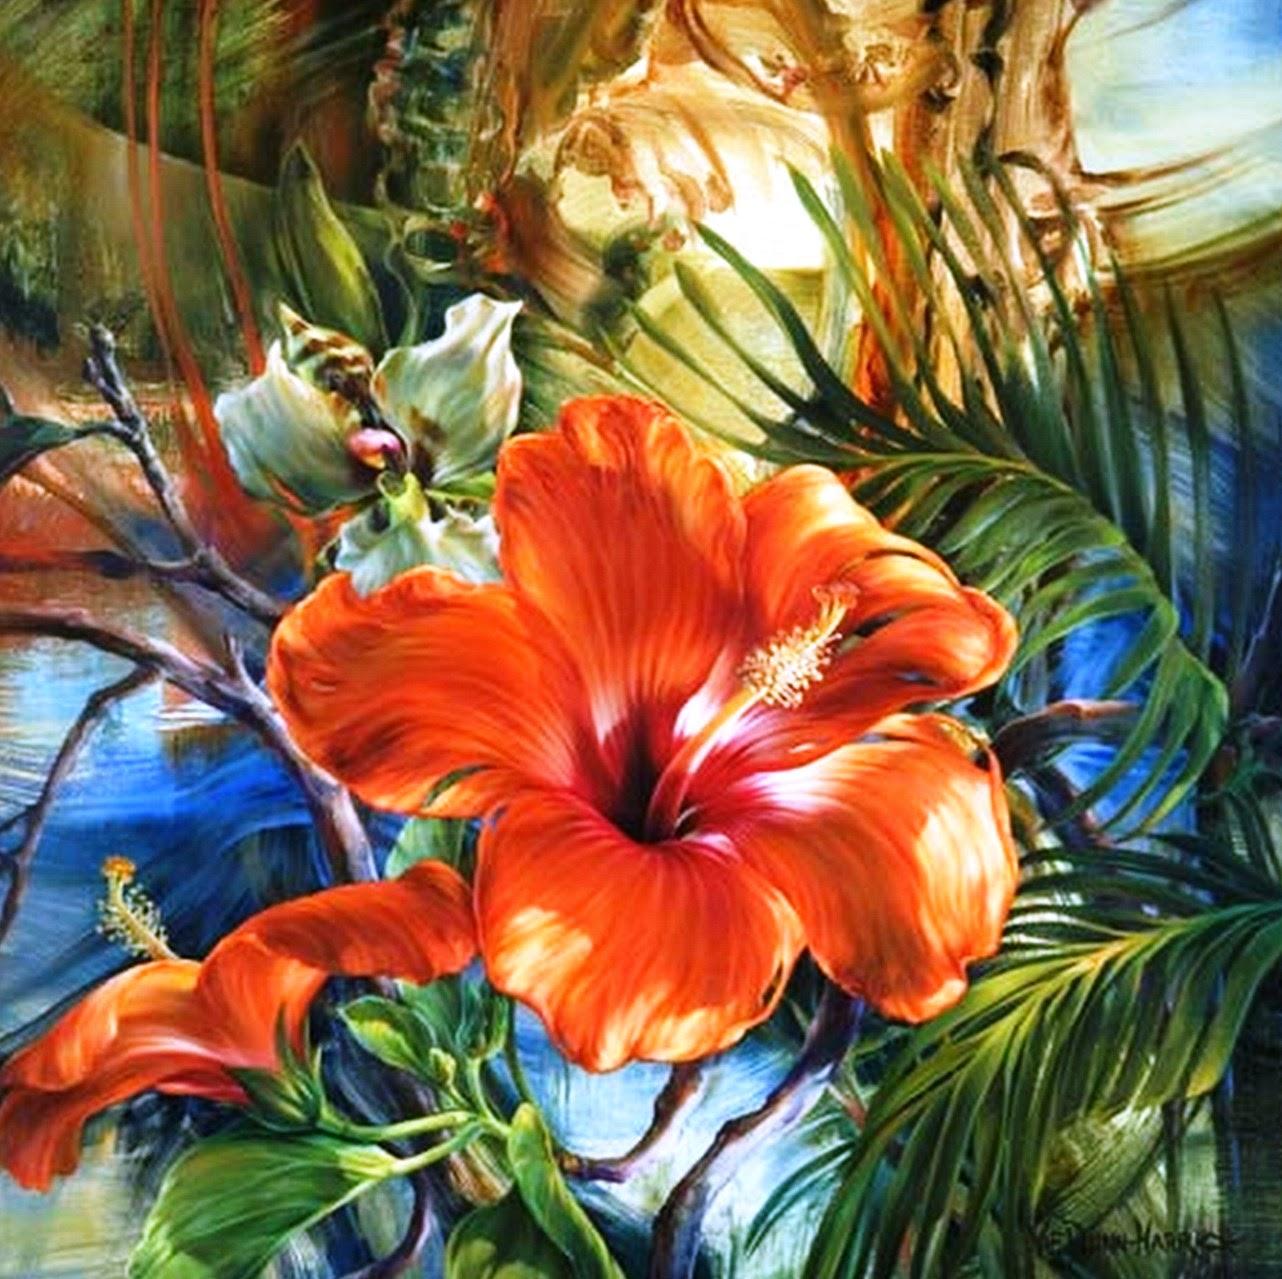 cuadro-moderno-de-flores-rojas